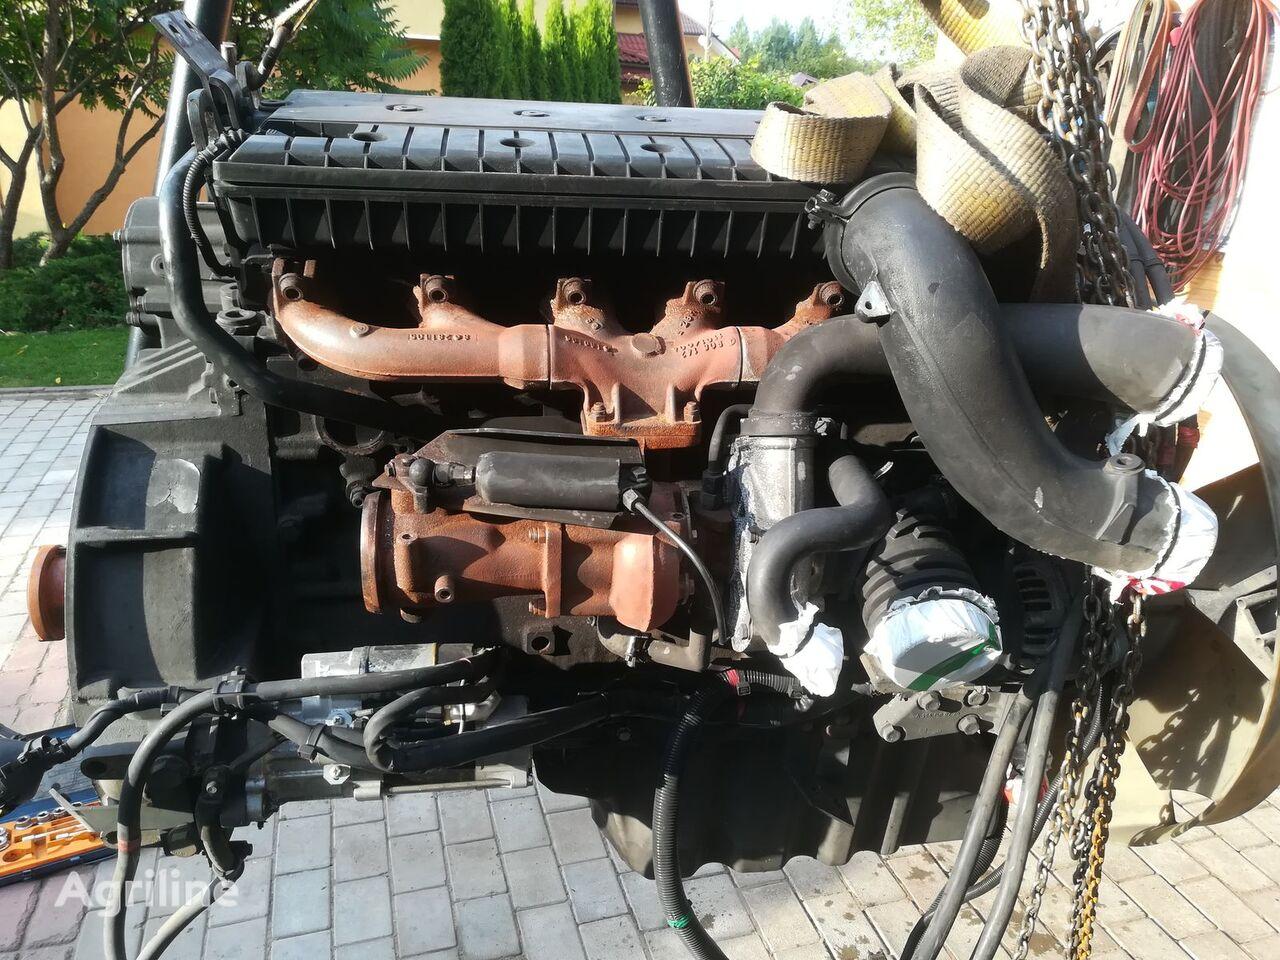 MERCEDES-BENZ OM 926 engine for CLAAS Tucano combine-harvester